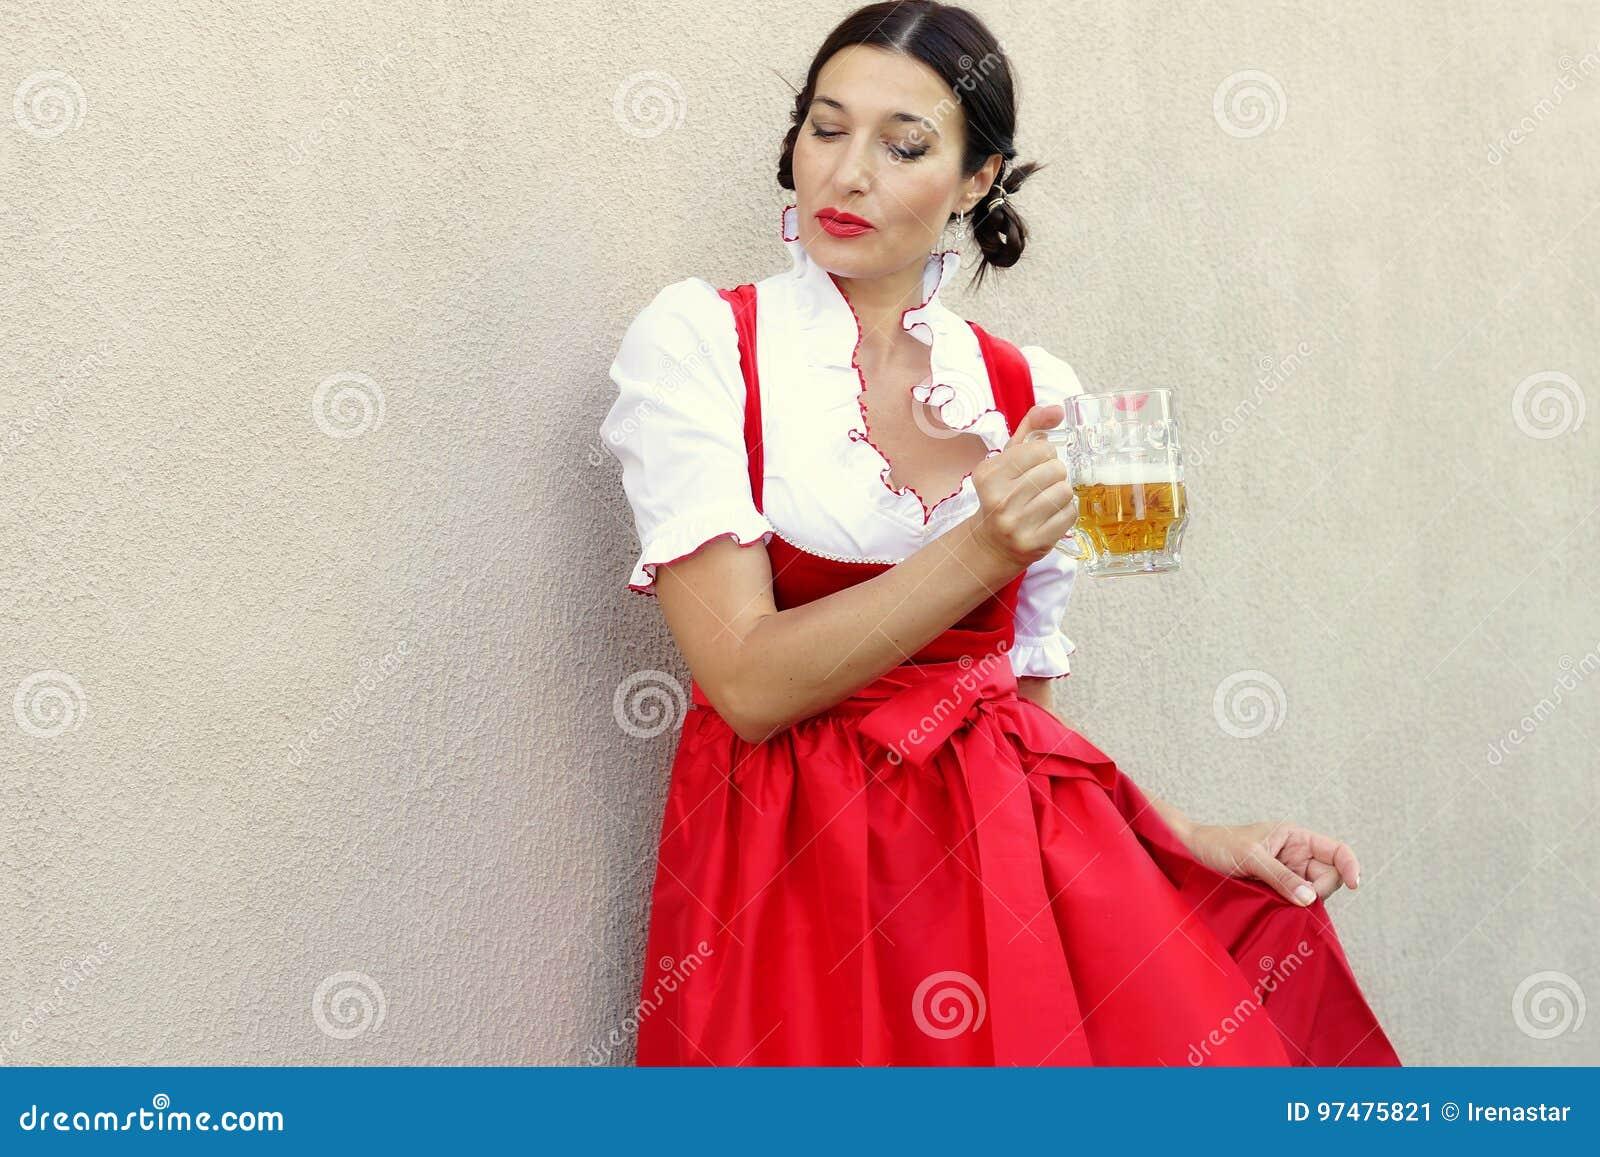 October fest concept.Beautiful german woman in typical oktoberfest dress dirndl holding a glass beer mug